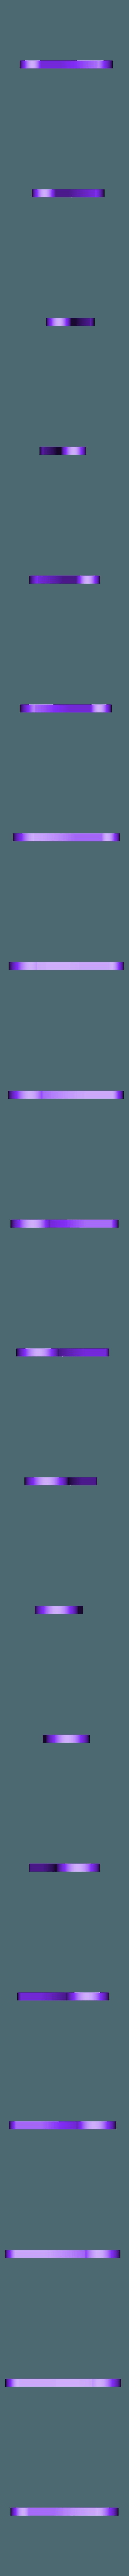 Rod_Connecting_6.3mm_Hole_1.2mm.stl Download free STL file Hummingbird • 3D printing model, gzumwalt